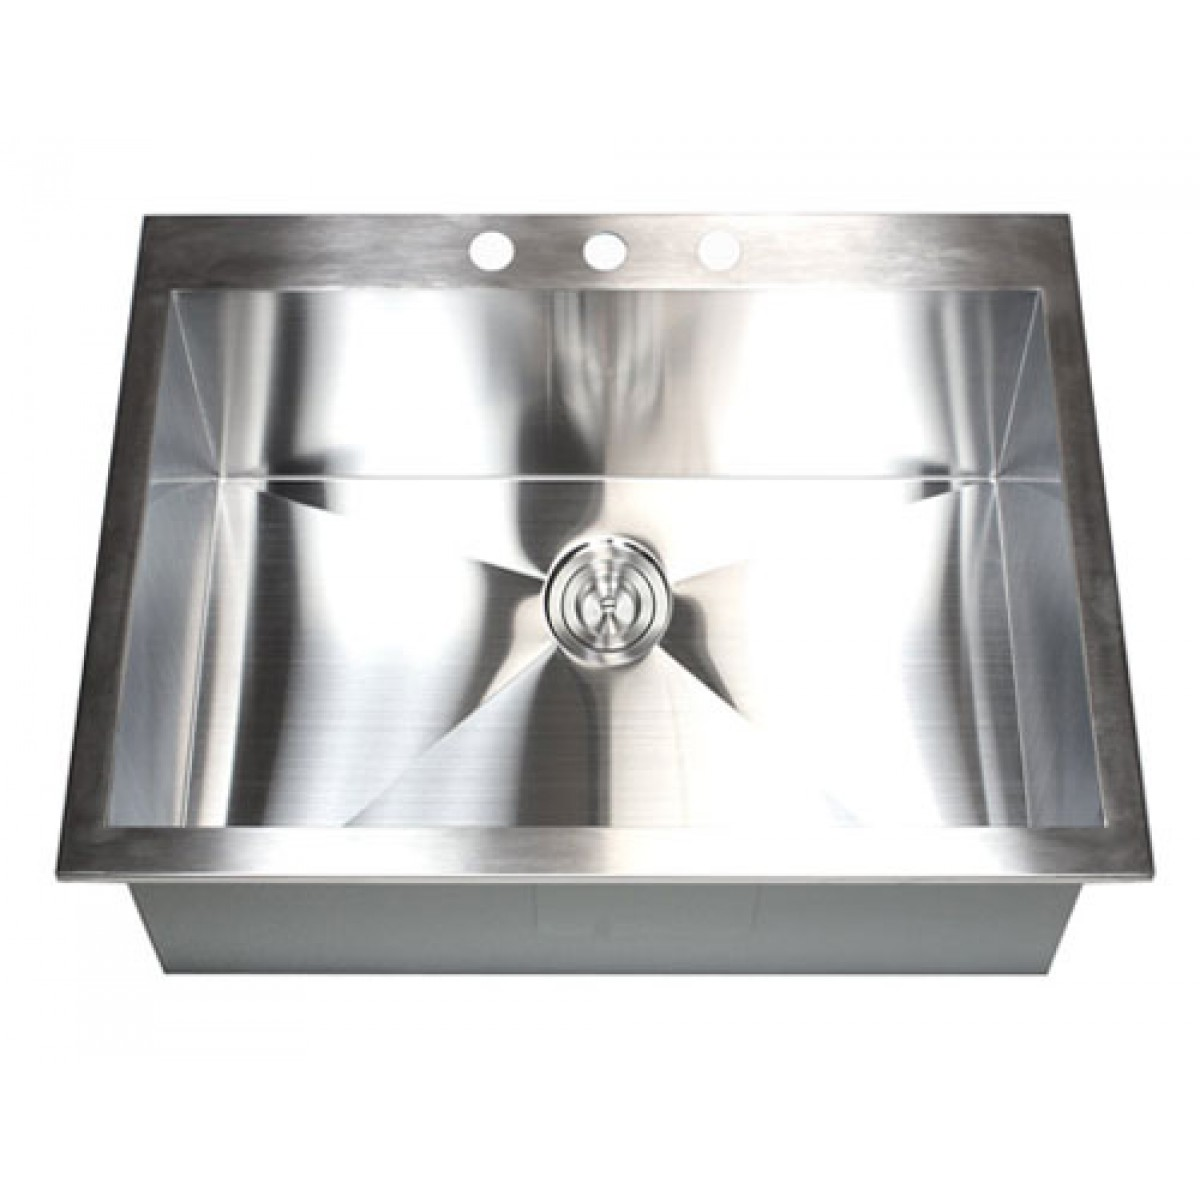 25 inch top mount   drop in stainless steel single bowl kitchen sink zero radius design 25 inch top mount   drop in stainless steel single bowl kitchen      rh   emoderndecor com